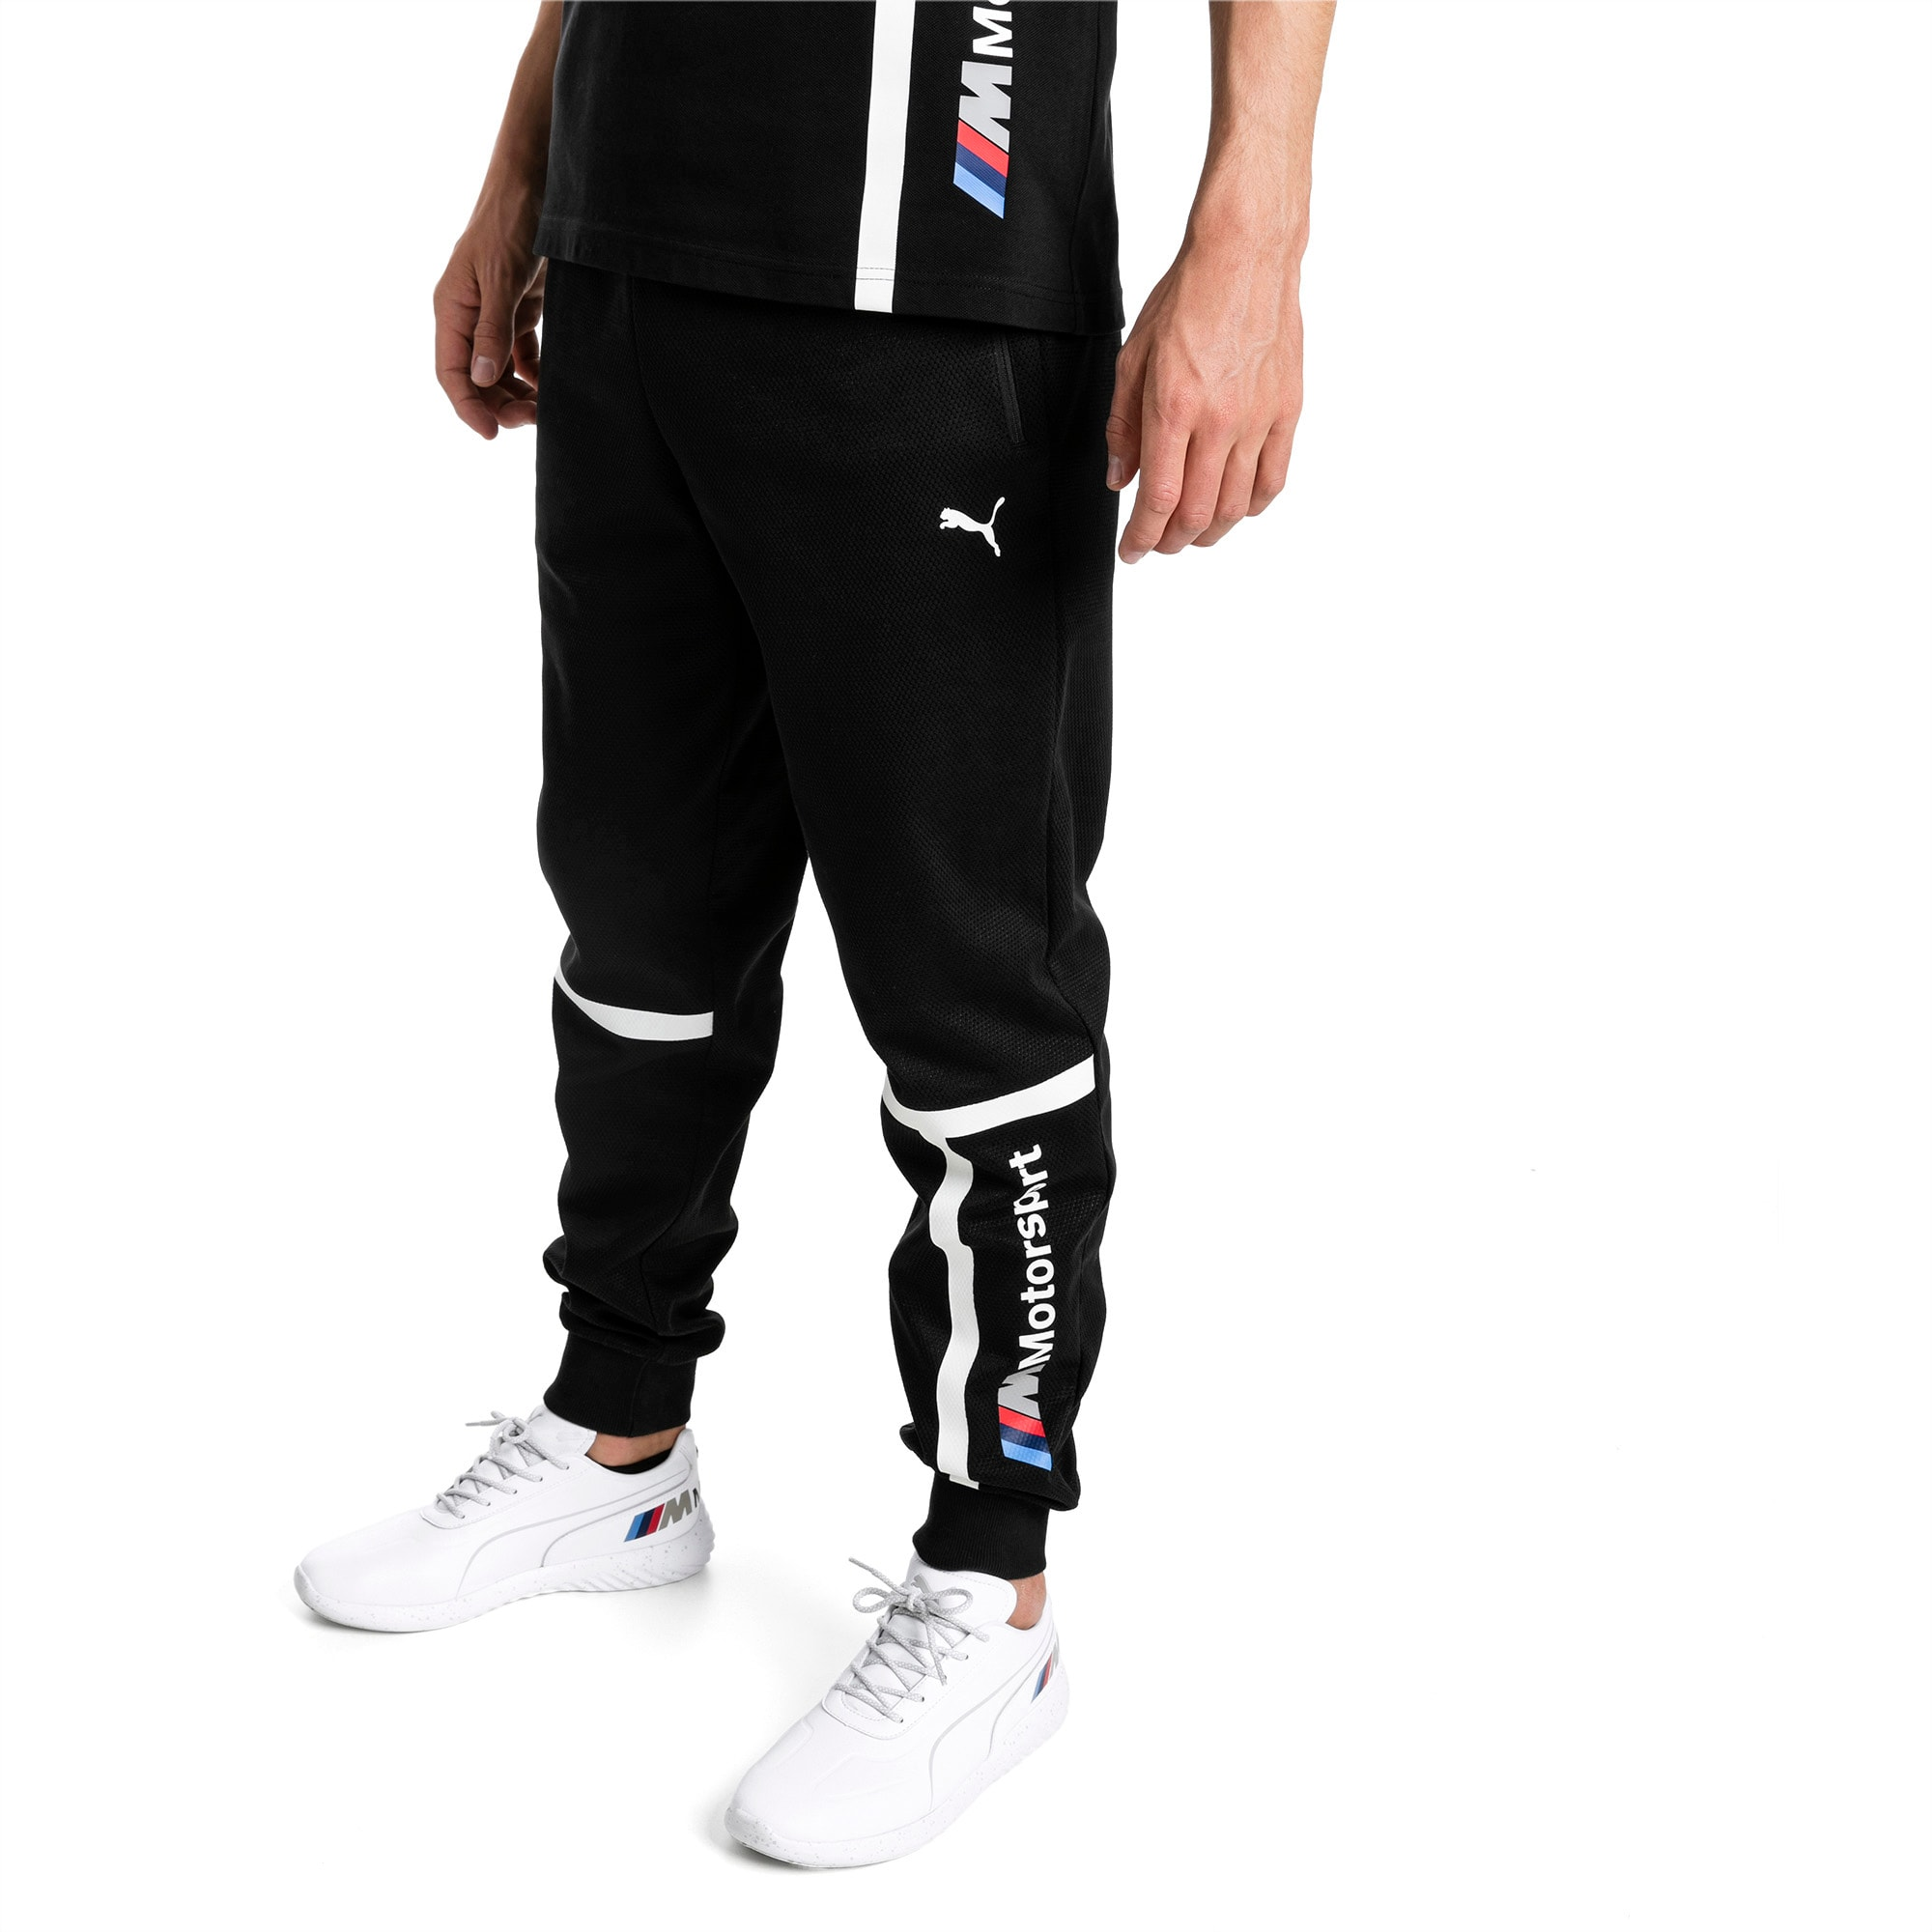 BMW Motorsport Knitted Men's Sweatpants